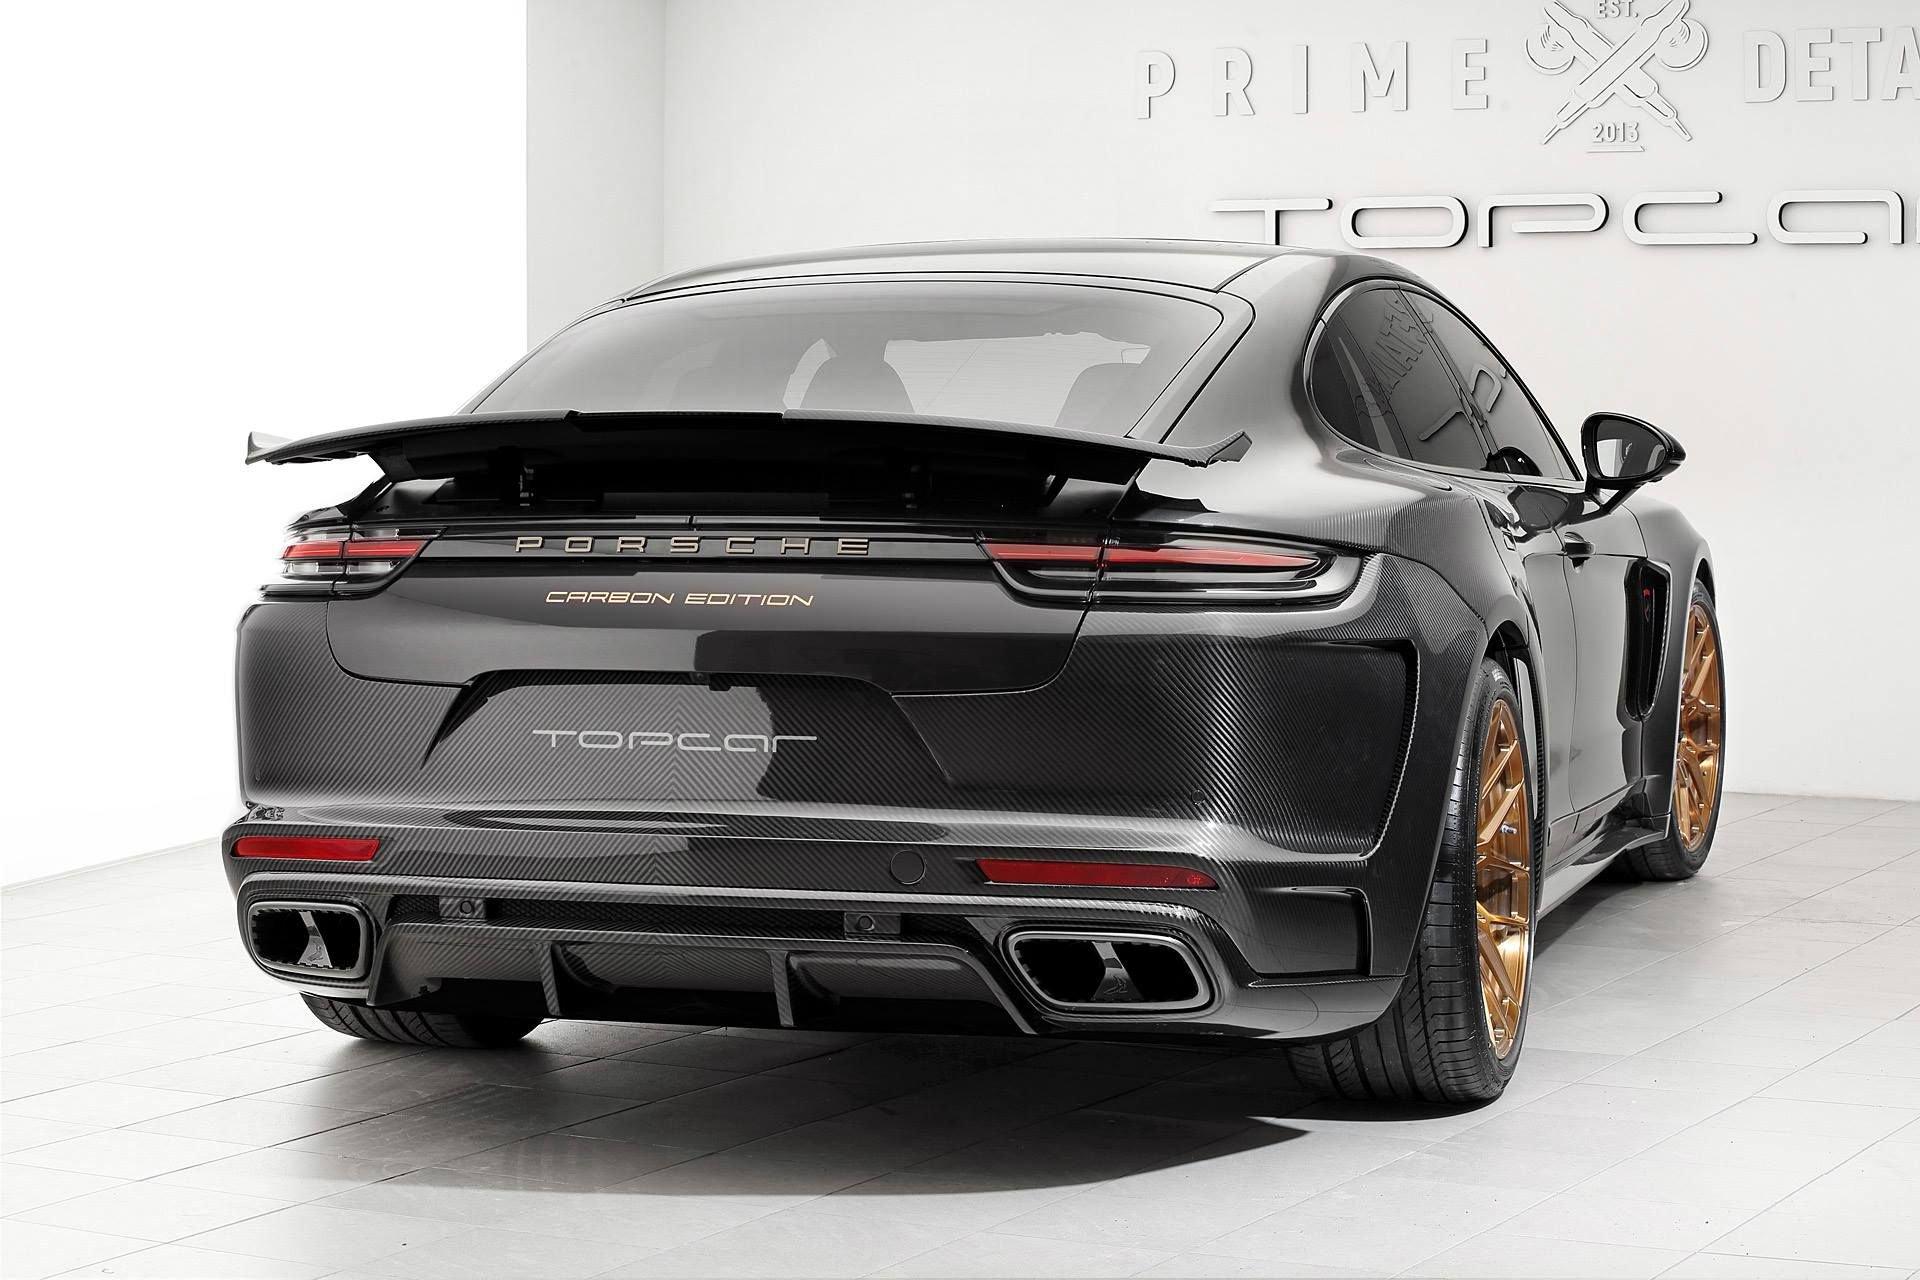 Porsche_Panamera_GTR_Carbon_Edition_by_TopCar_0005